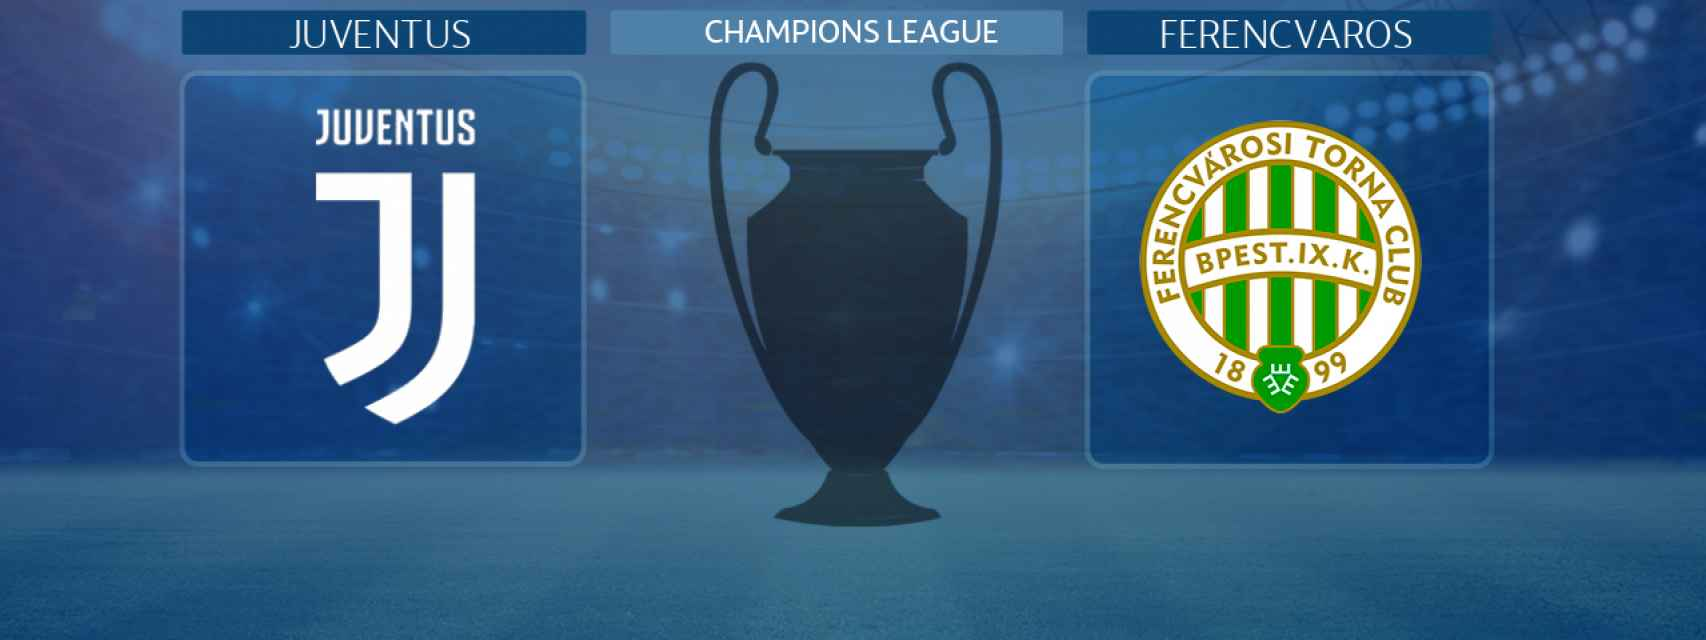 Juventus - Ferencvaros, partido de la Champions League